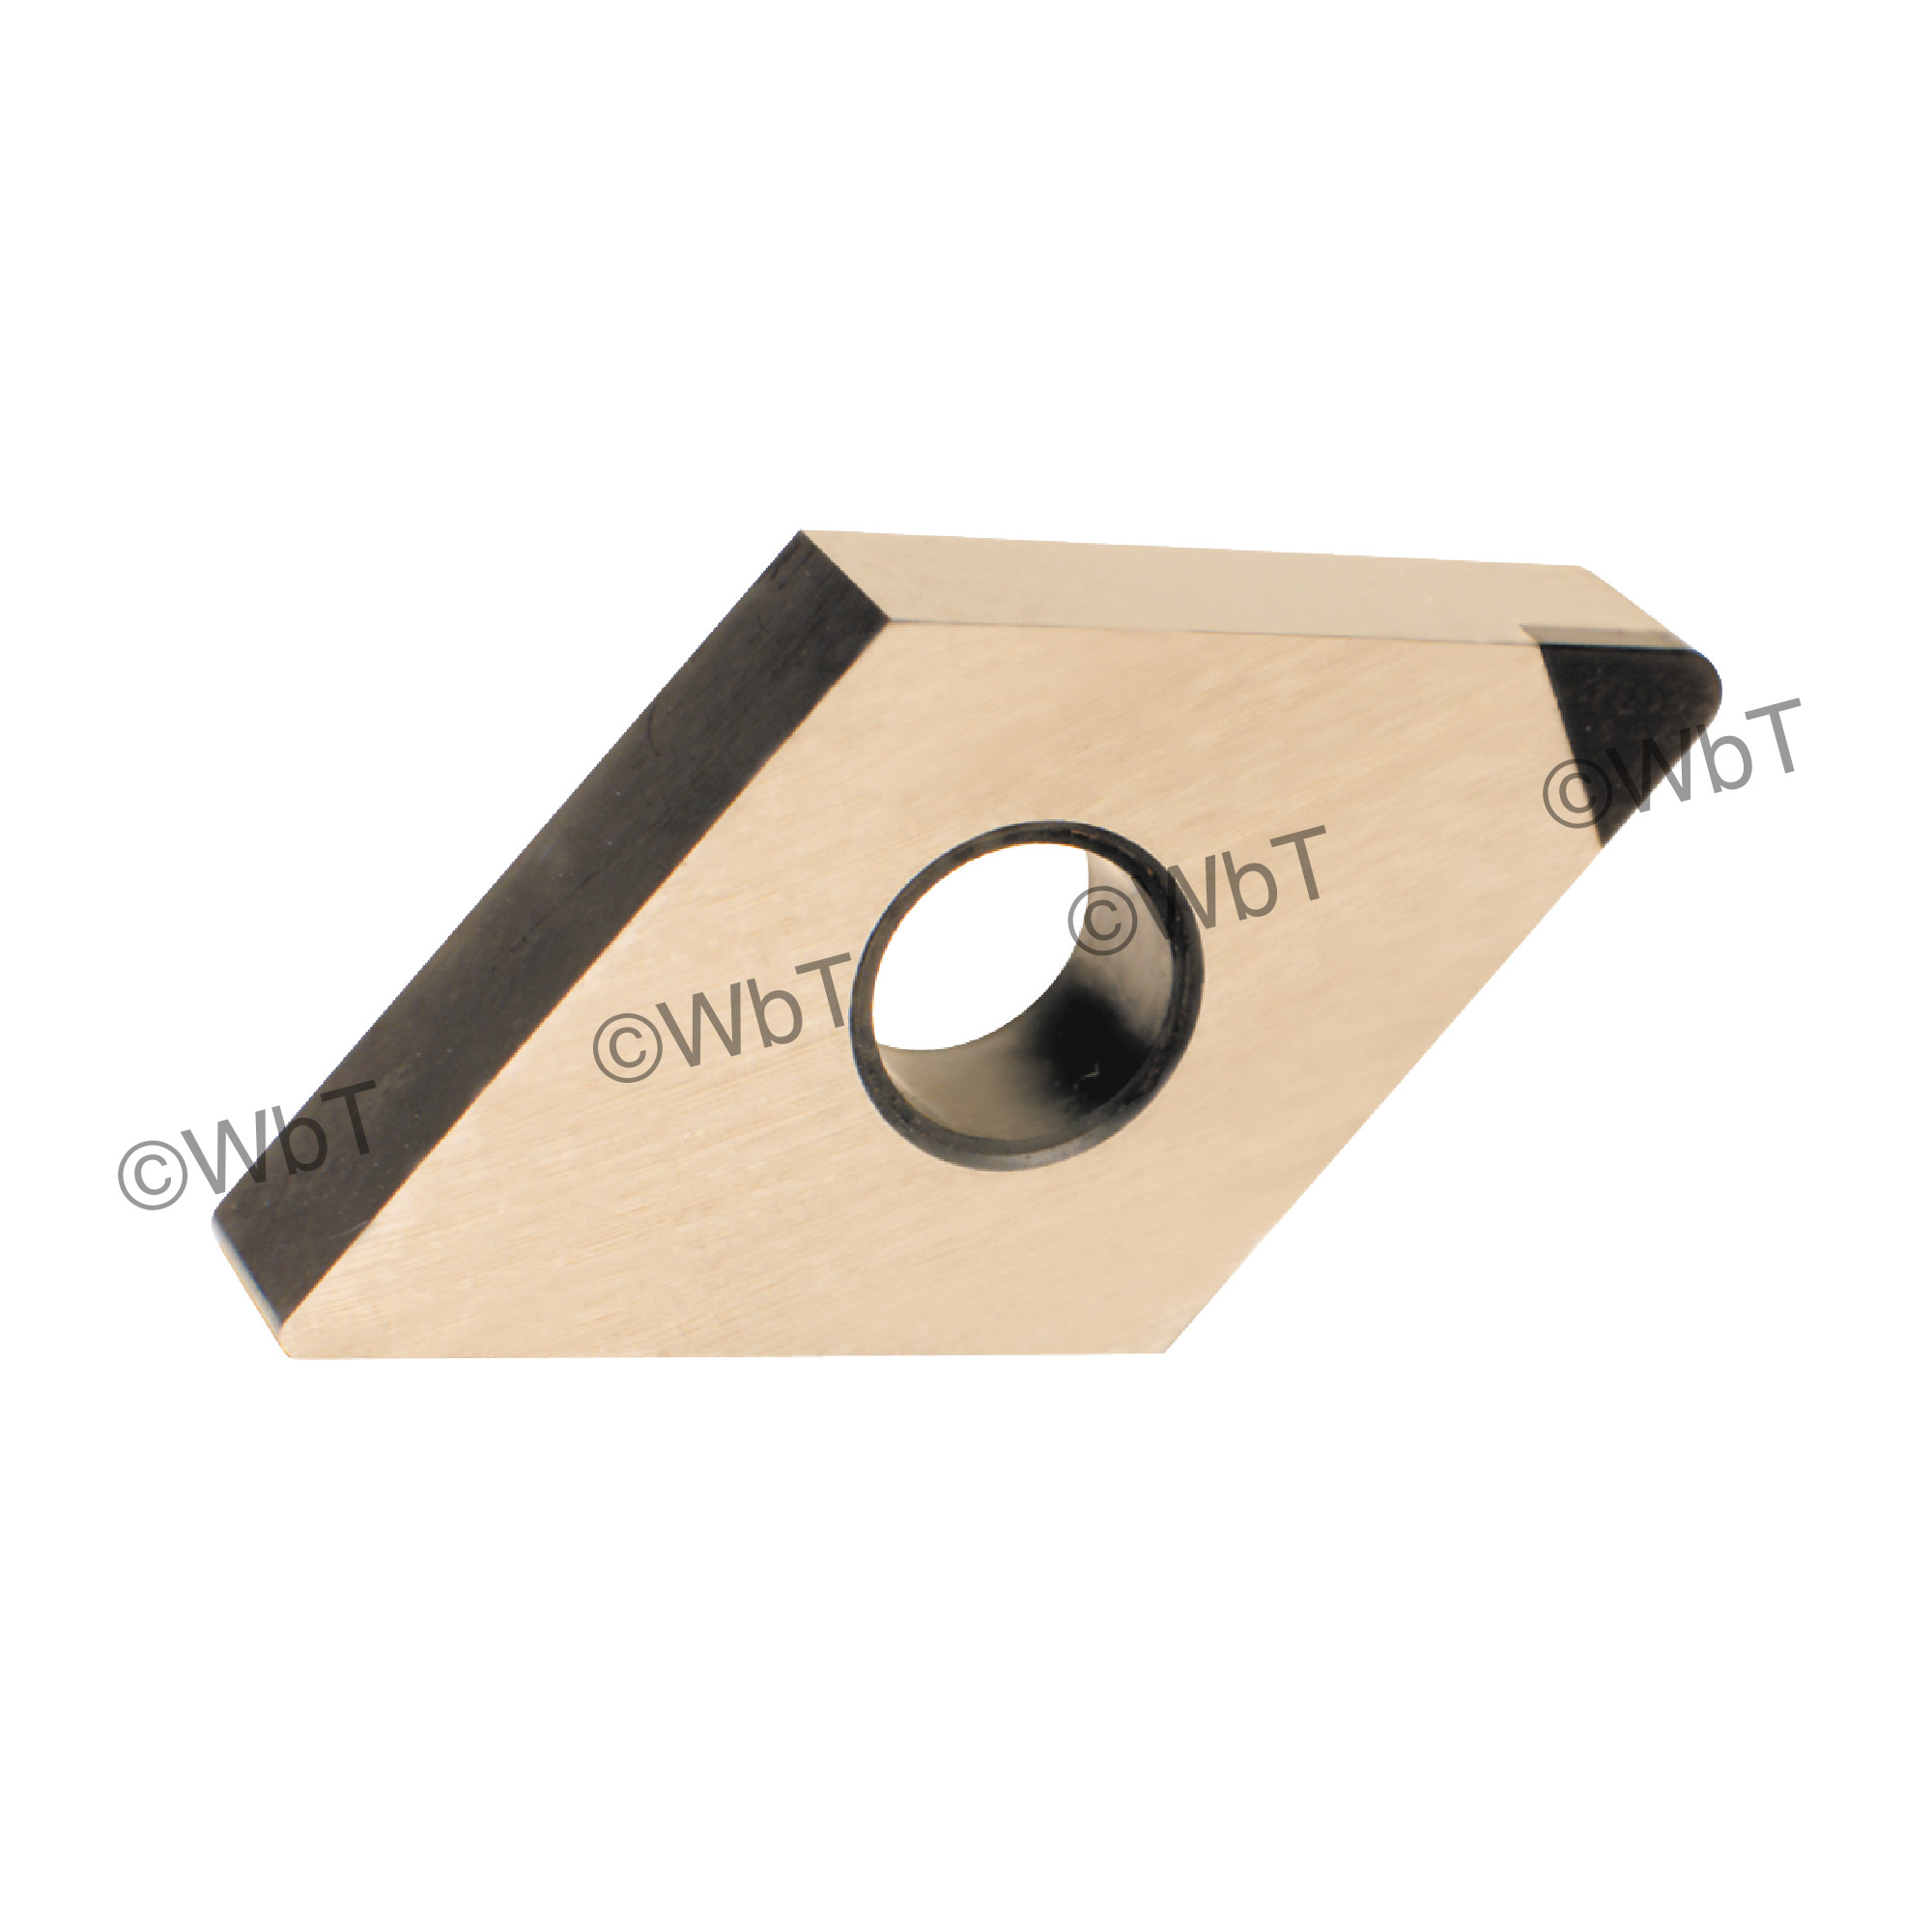 TTC PRODUCTION - DNGA431 CBN8 - 55° Diamond / Indexable CBN - Cubic Boron Nitride Turning Insert